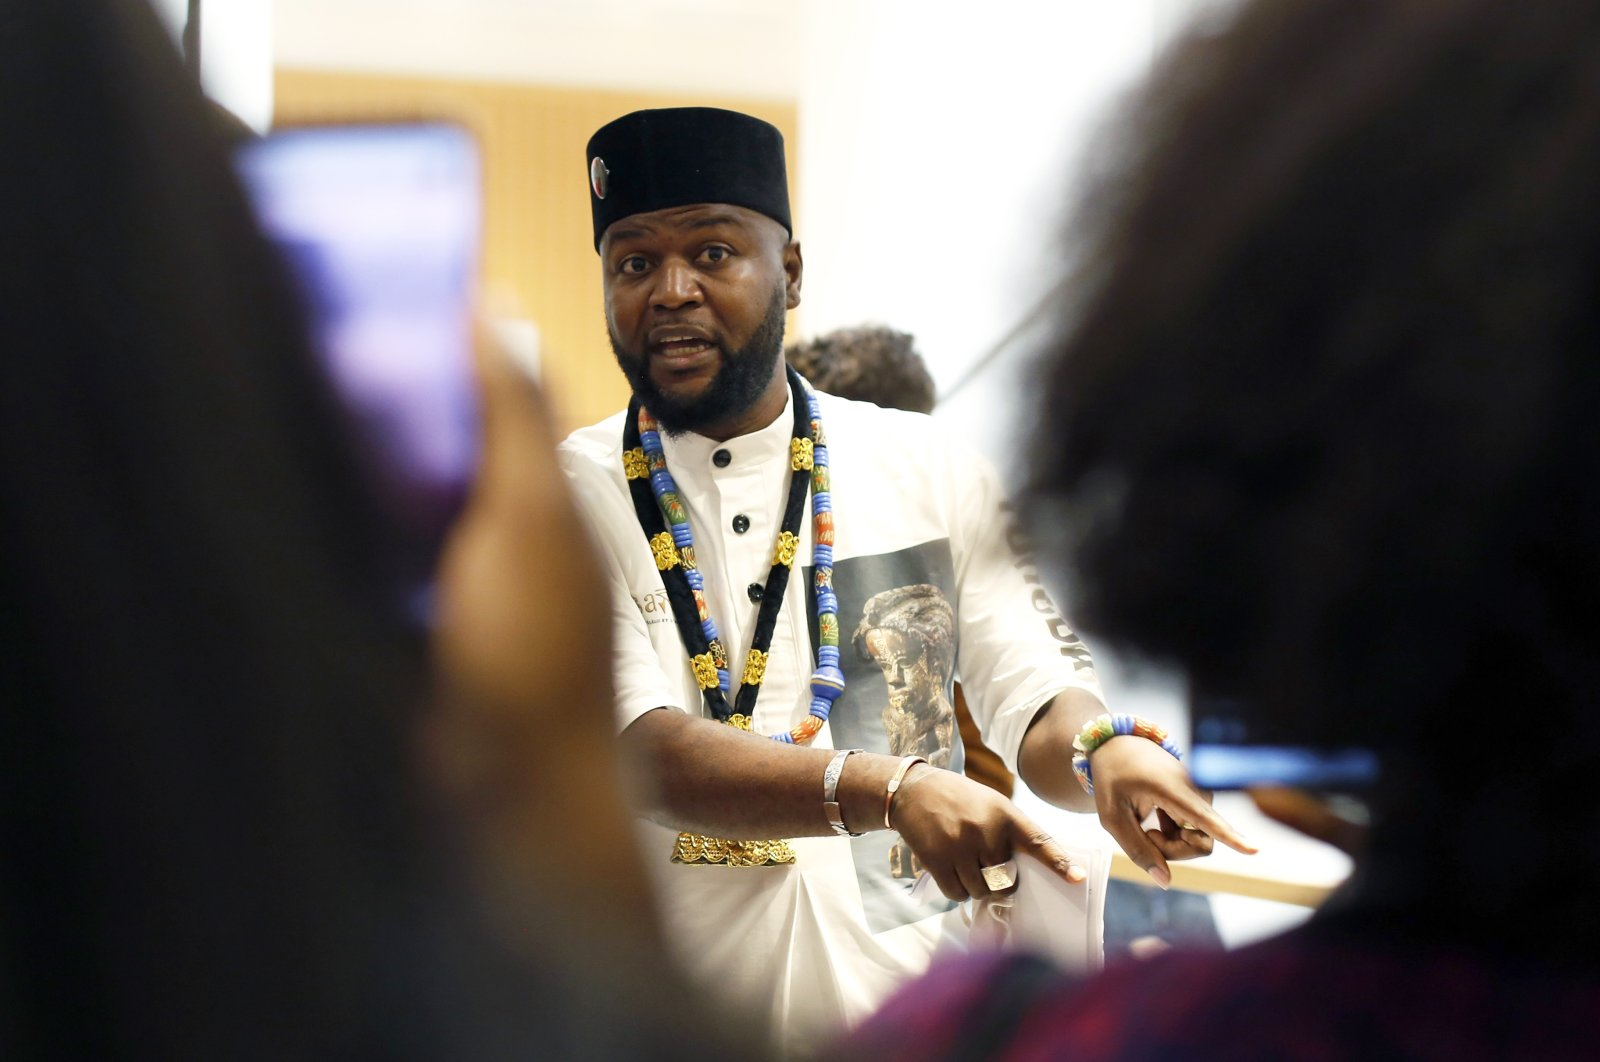 Congolese activist Mwazulu Diyabanza talk to the media at the Palais de Justice courthouse, in Paris, Sept. 30, 2020. (AP Photo)